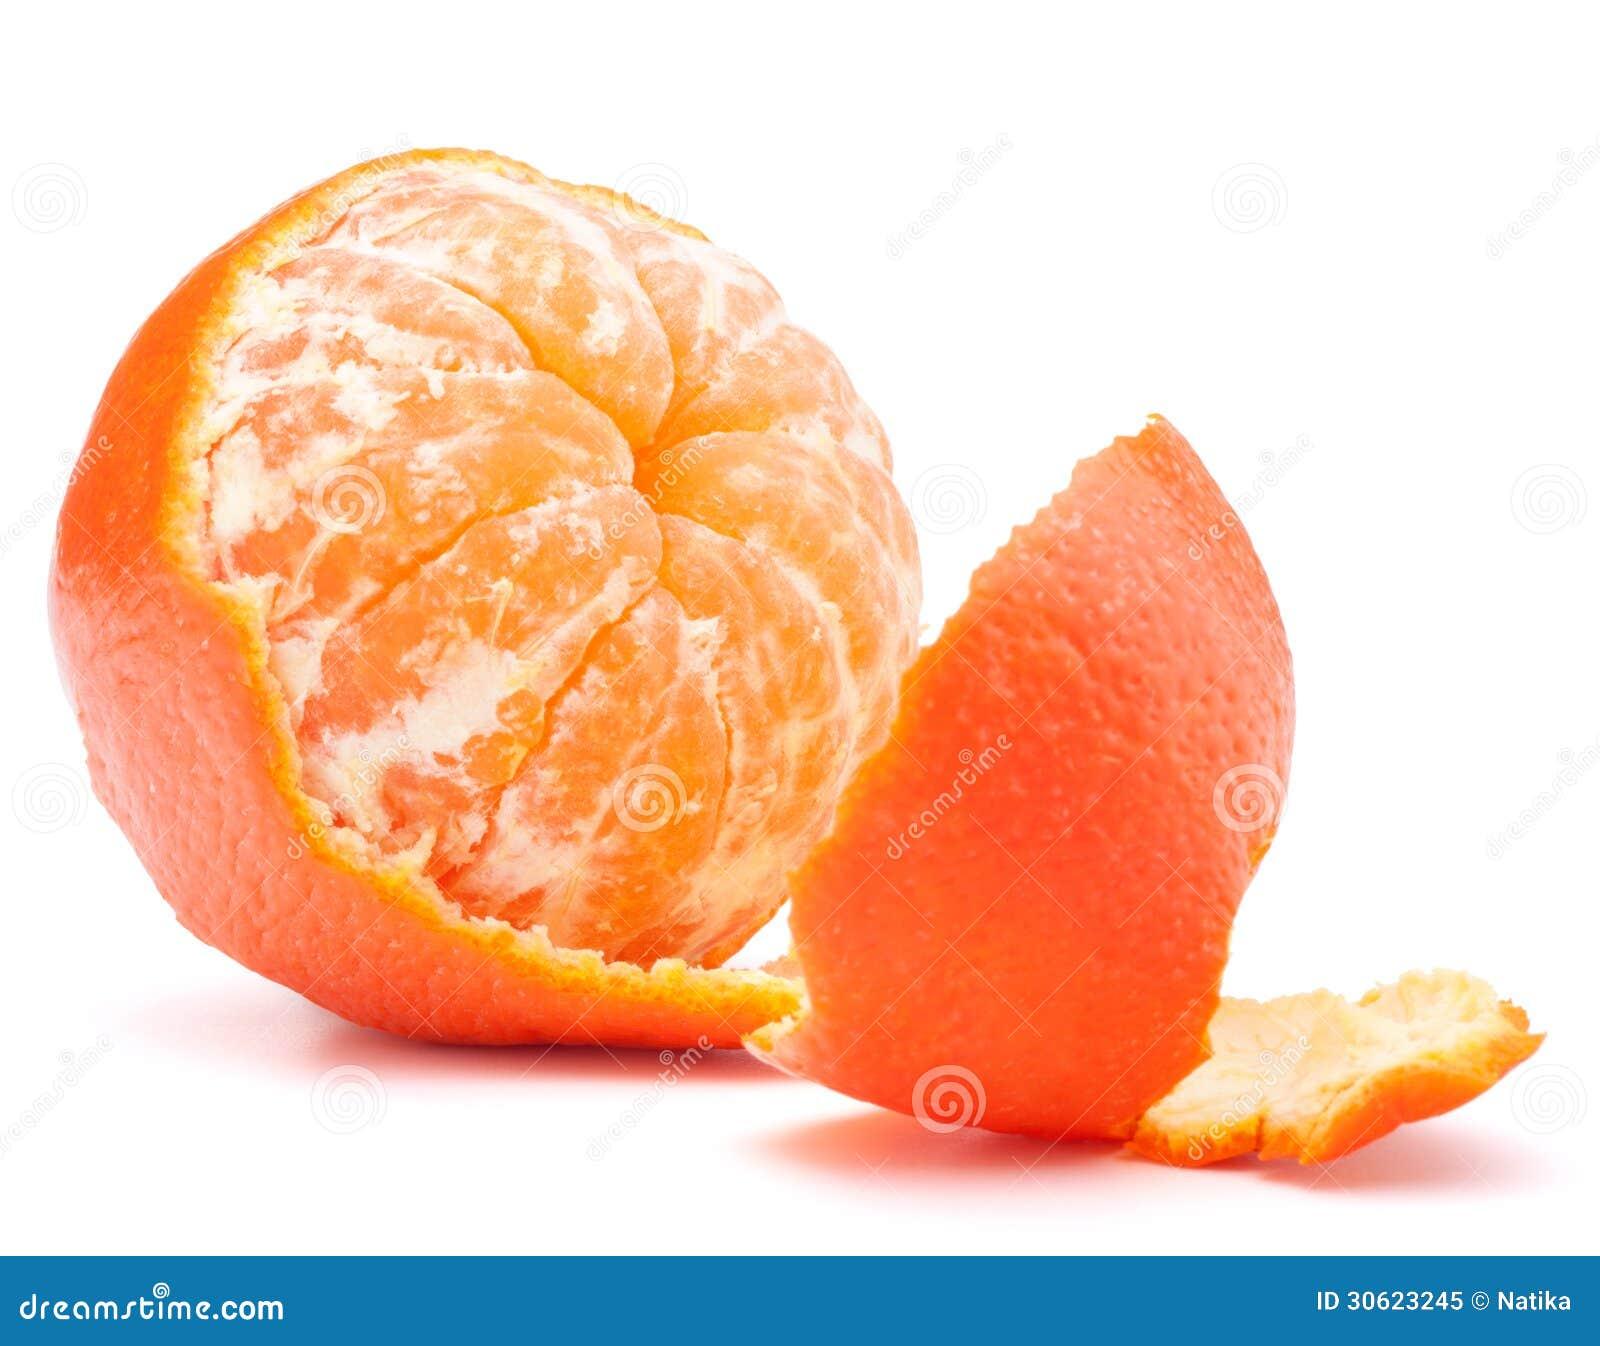 how to make mandarin pineapple dream